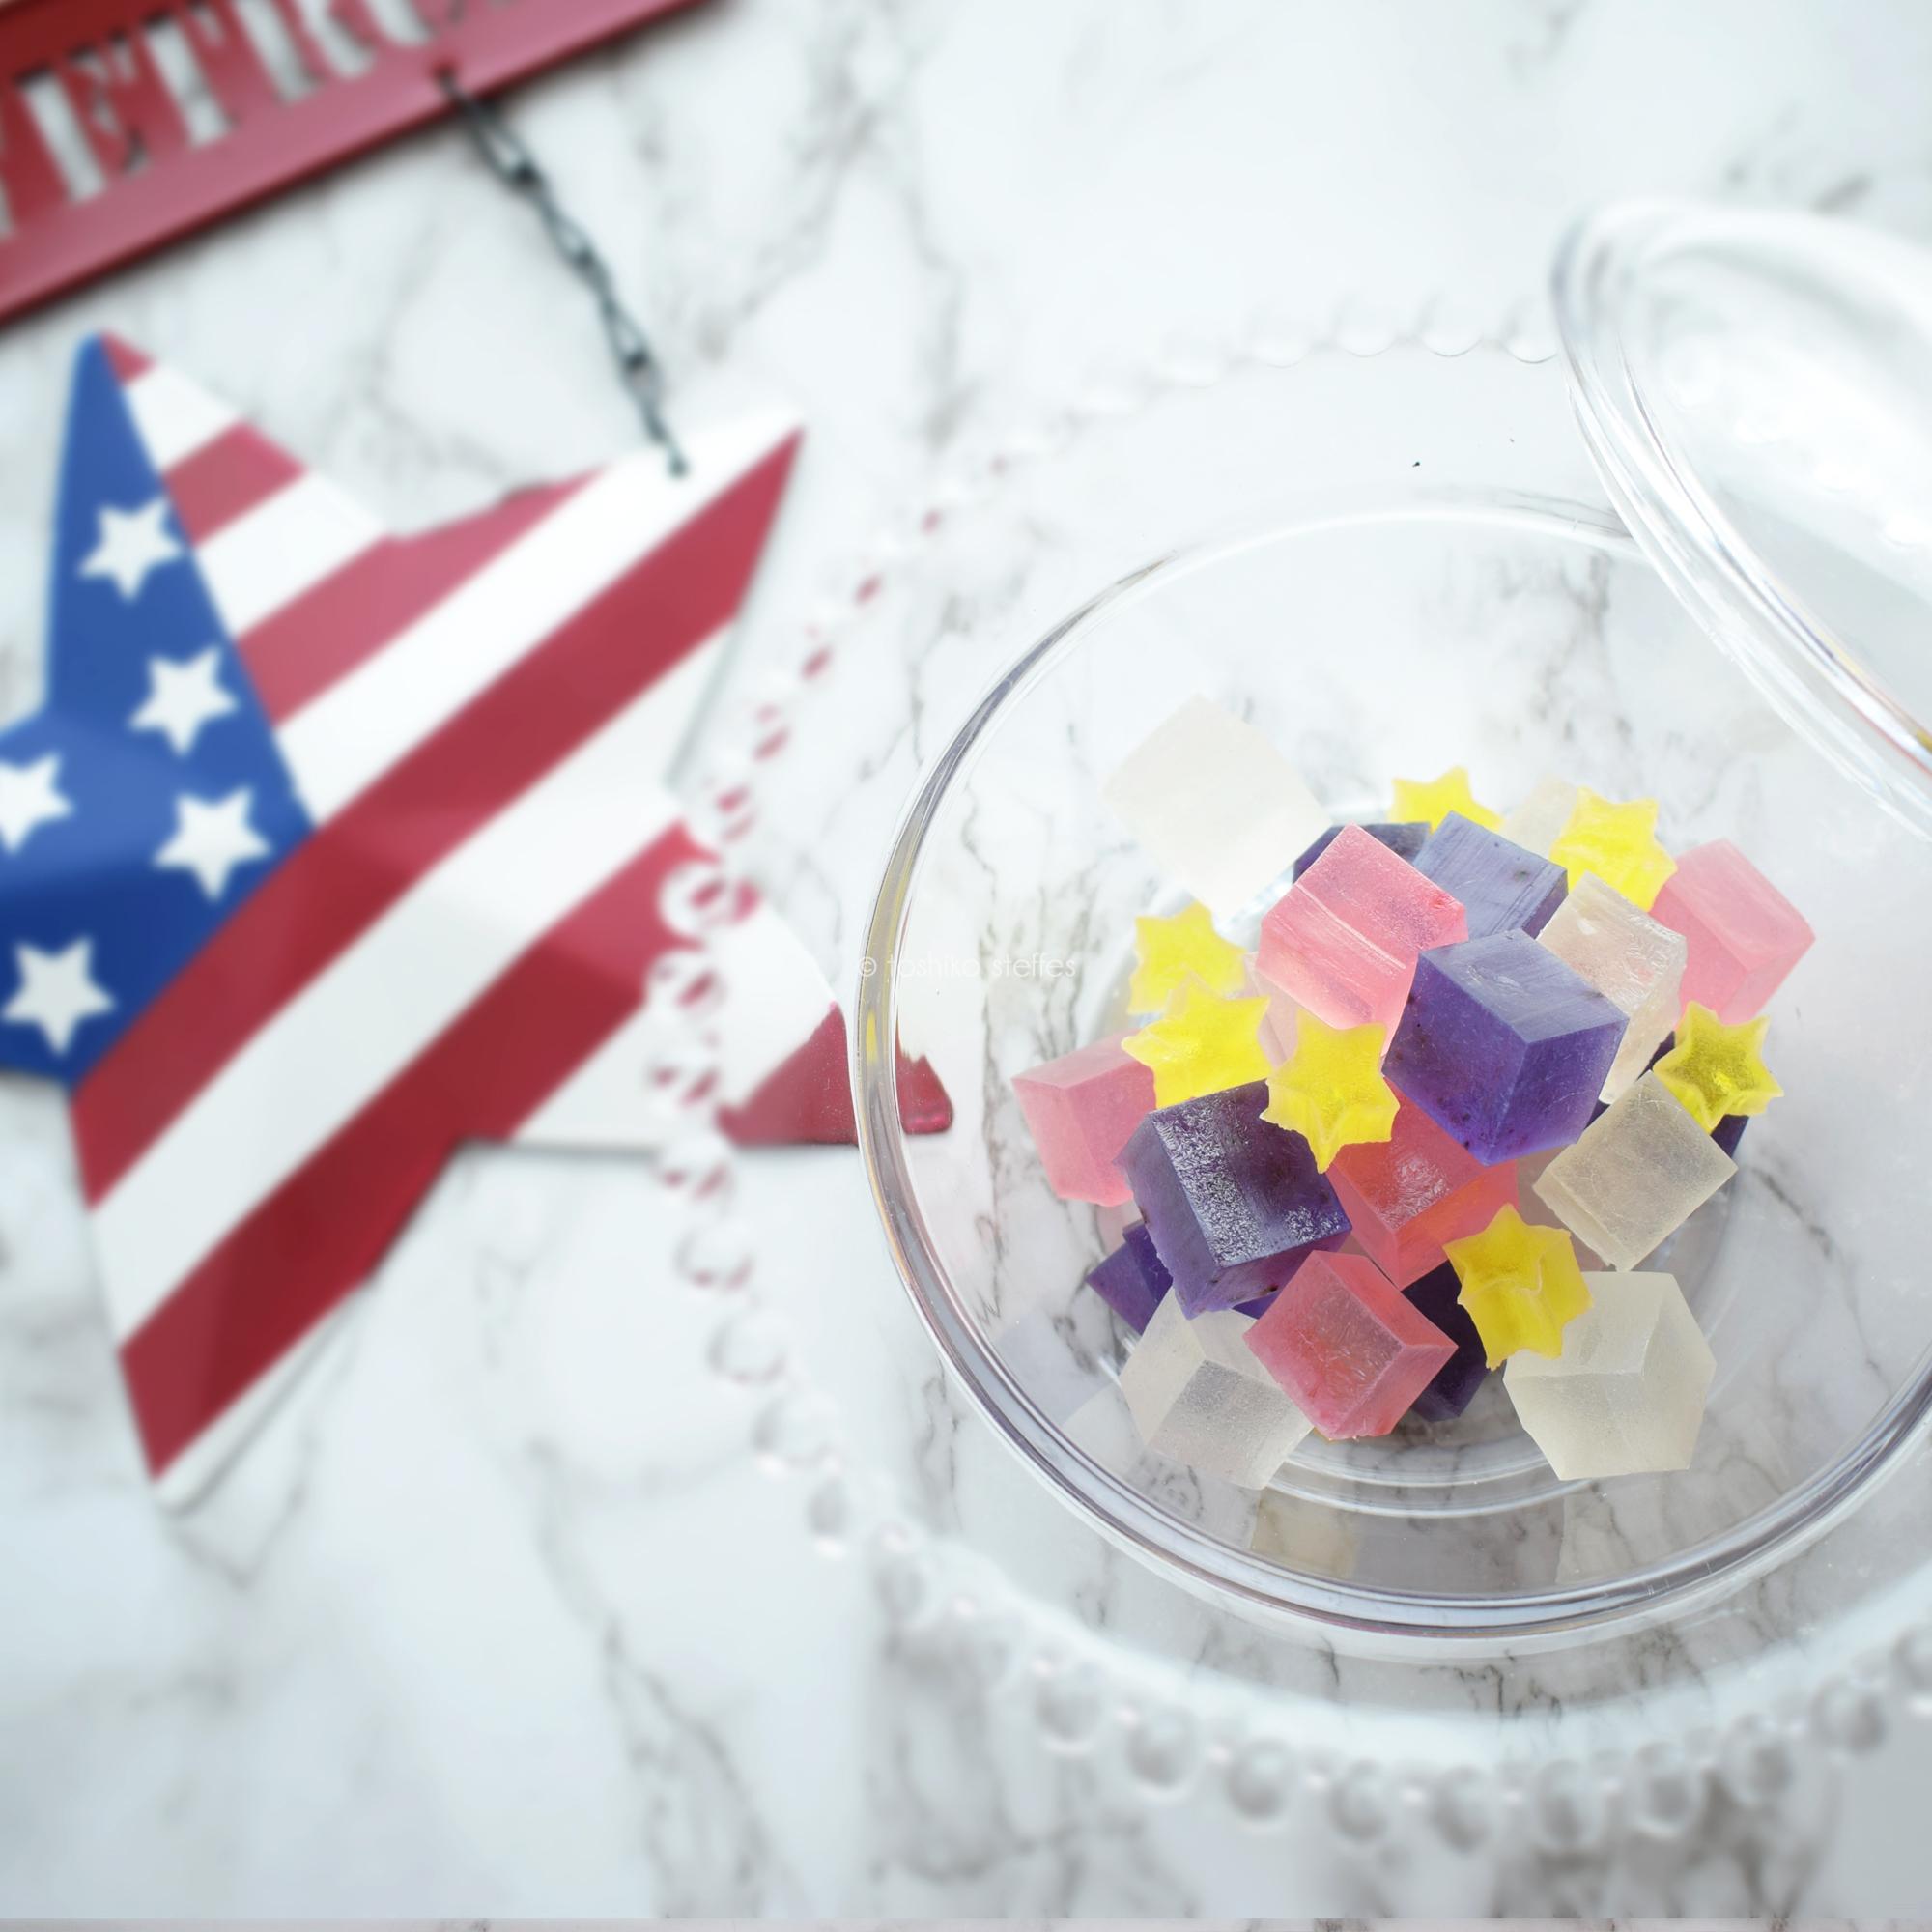 星条旗の琥珀糖